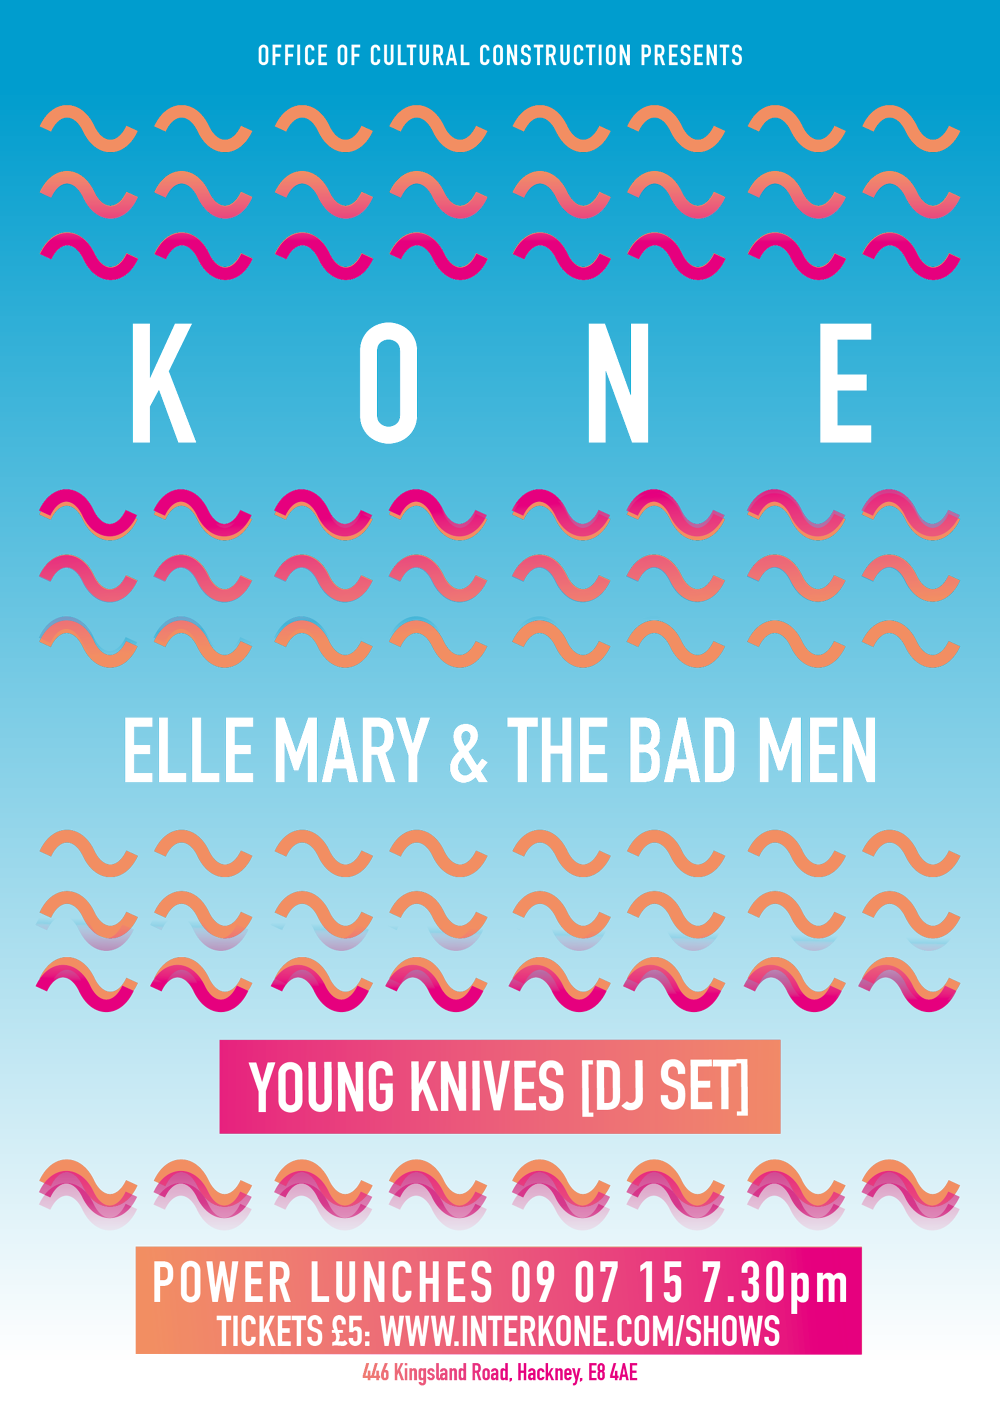 THURSDAY 9TH JULY: Kone, EM&TBM, Young Knives (DJ set) / Power